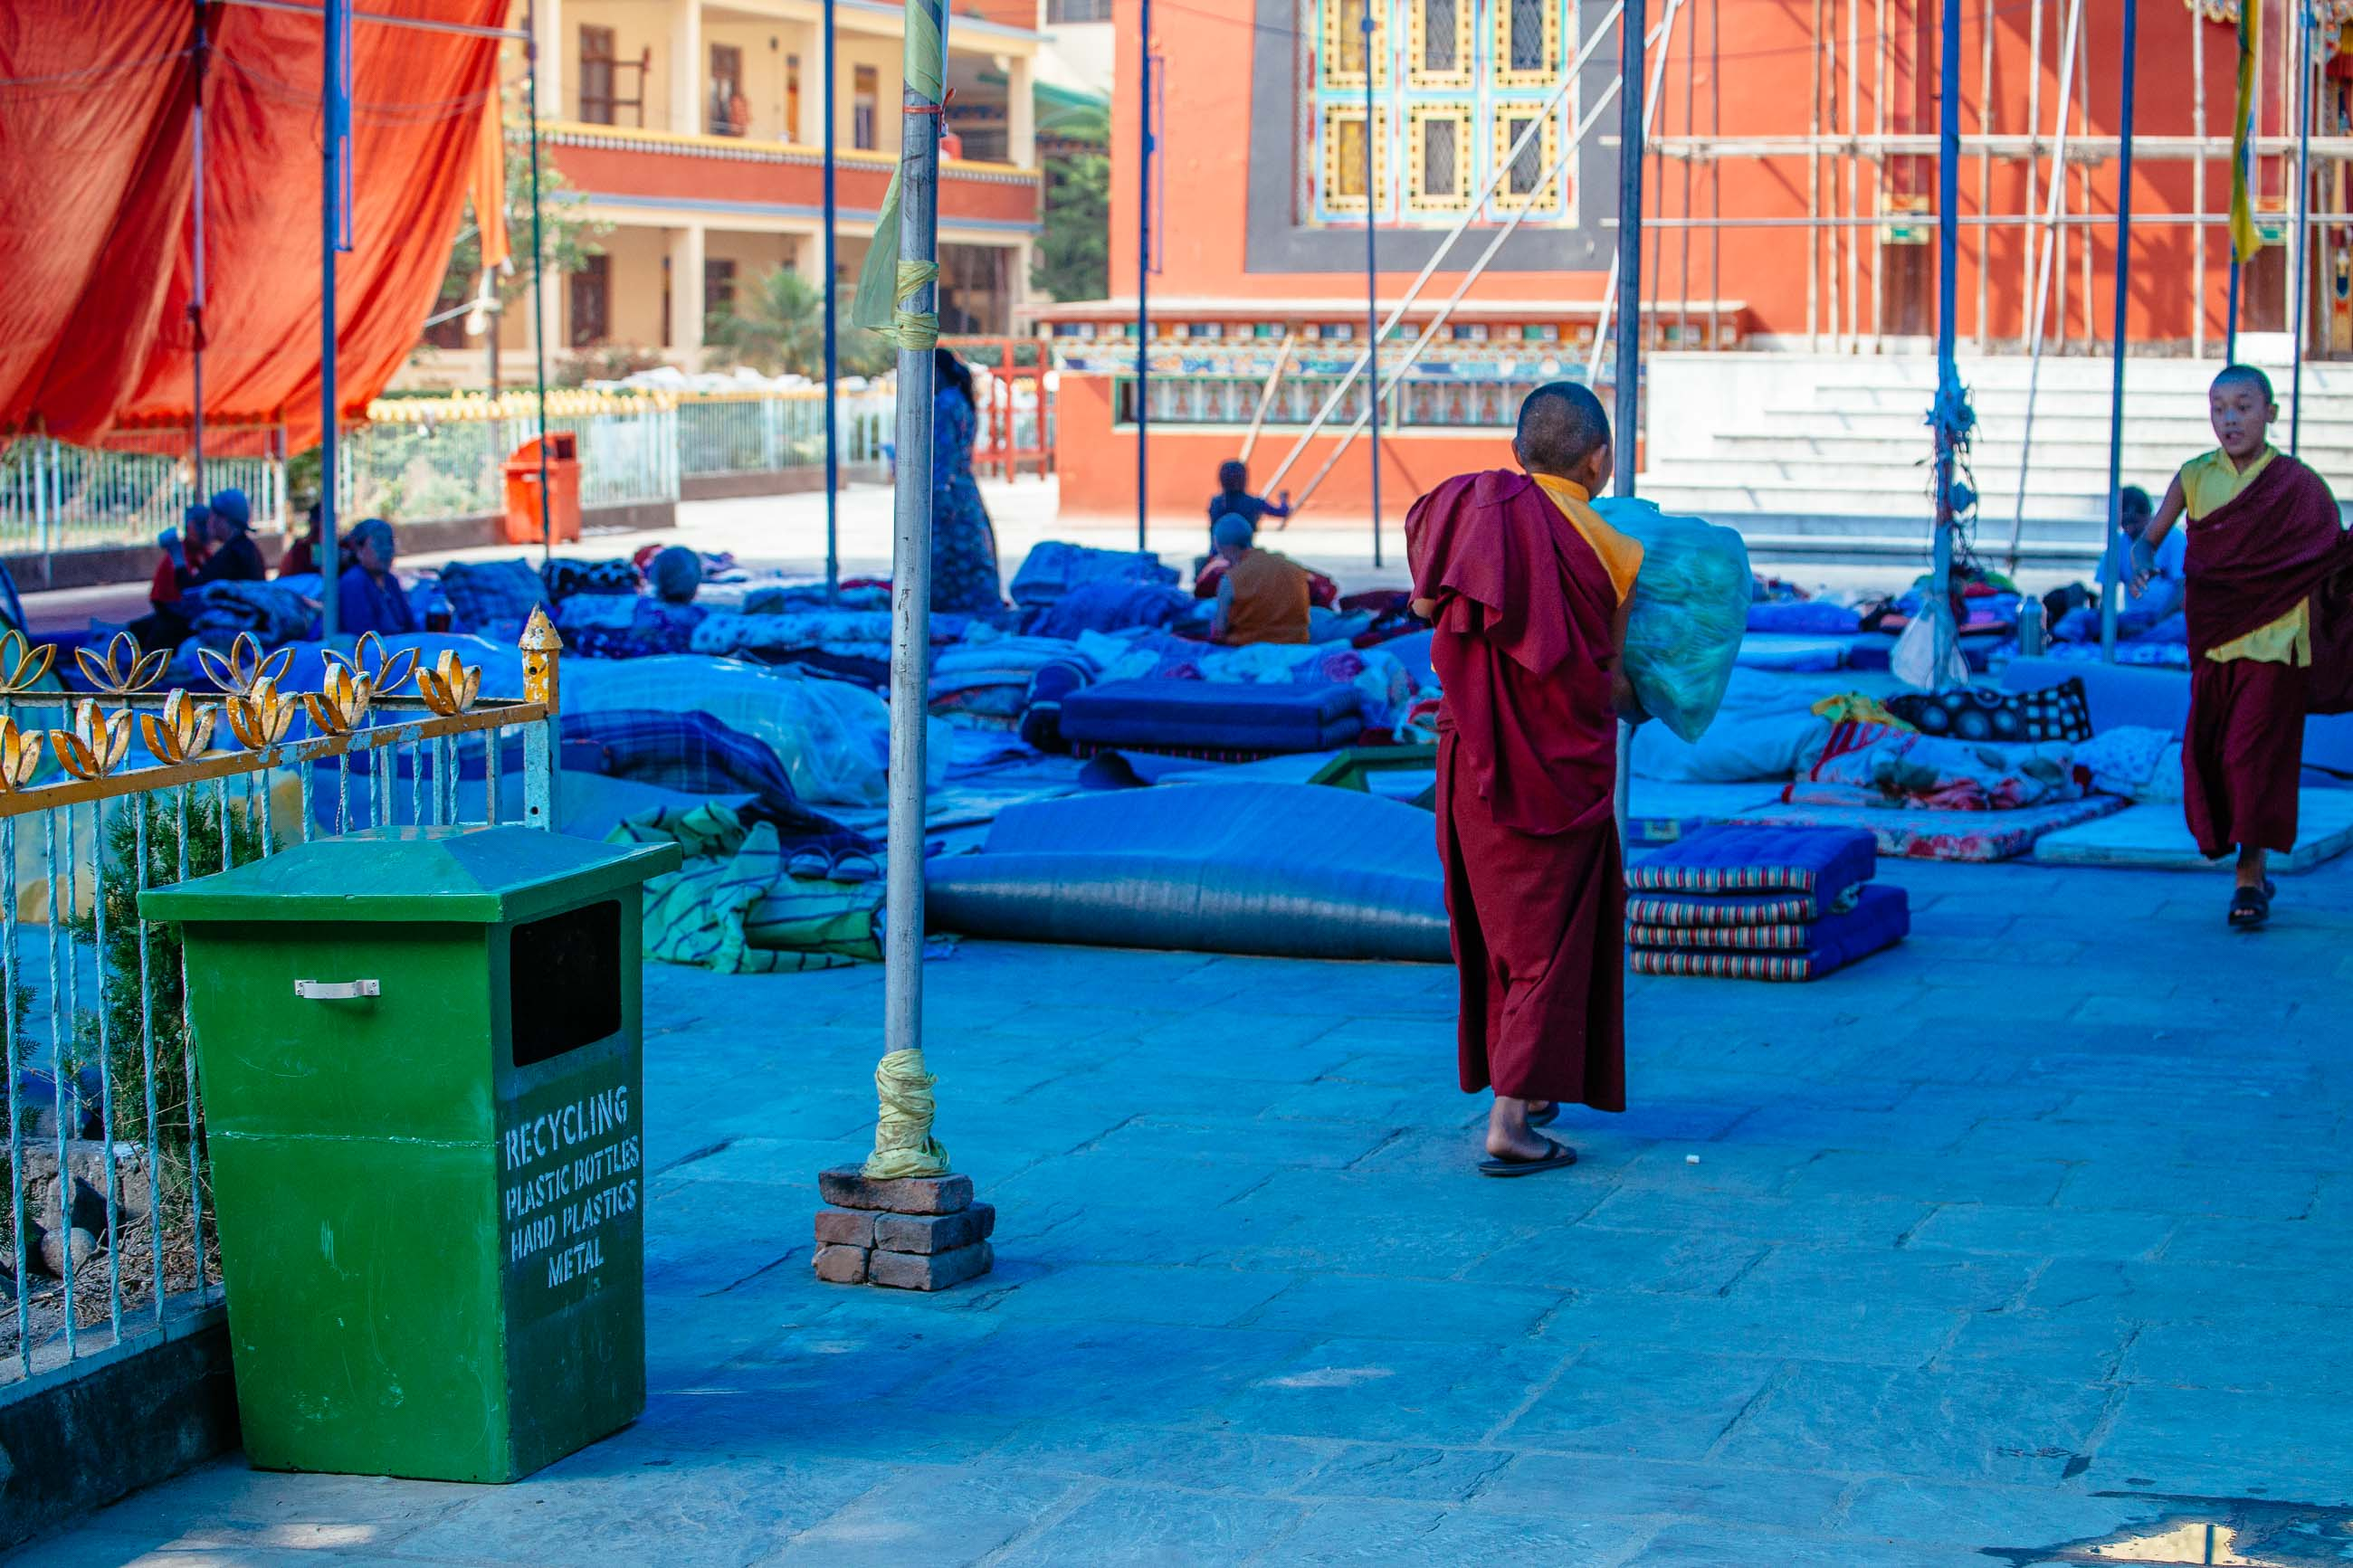 Monastery Shelter, Kathmandu, Nepal Jun 2015